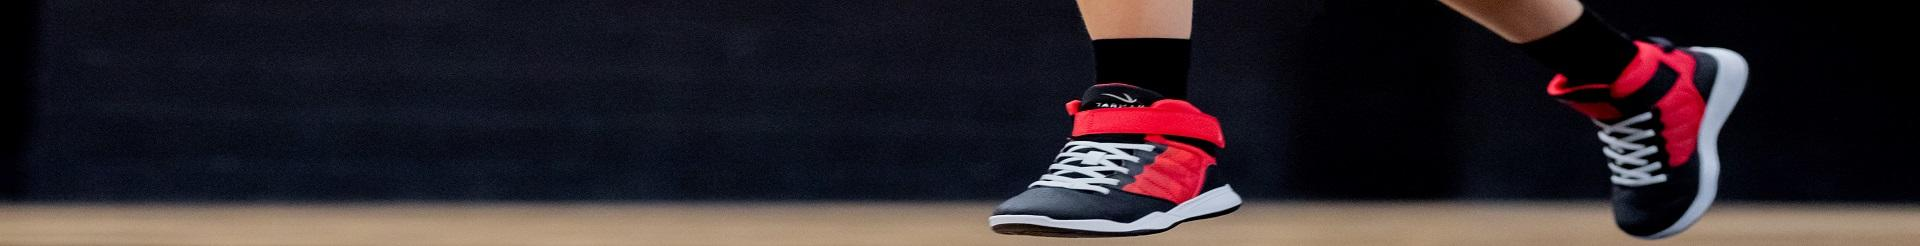 Children's Basketball Shoes